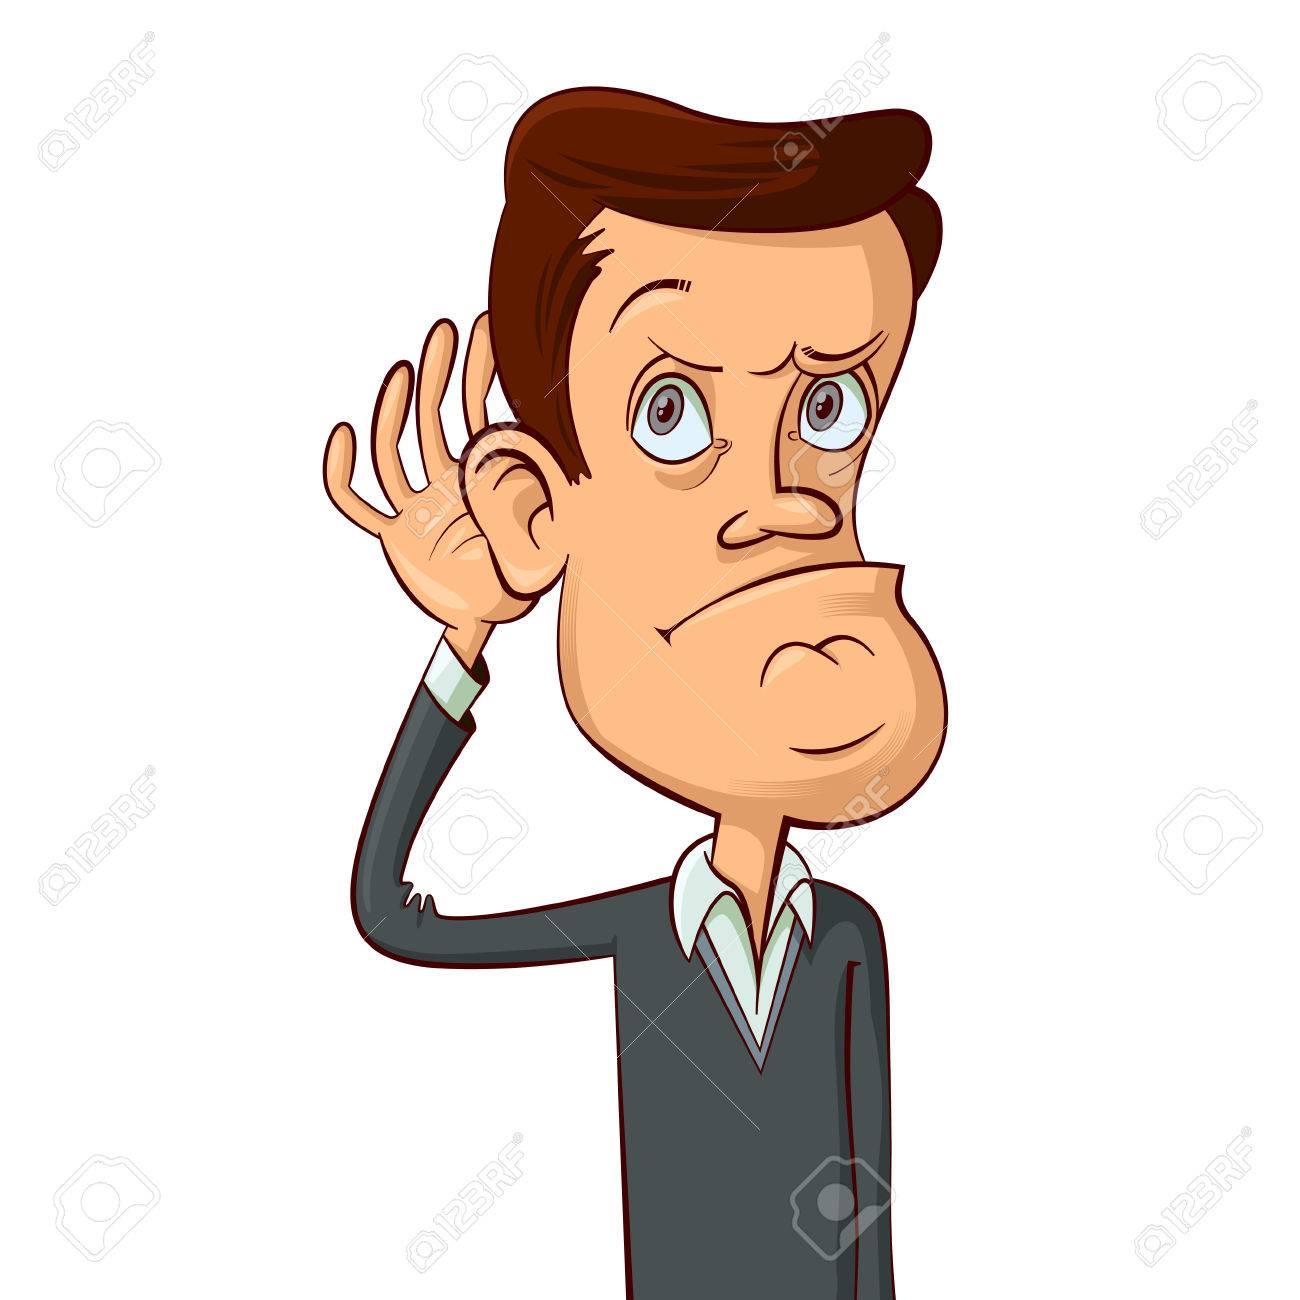 man holds his hand near ear, cartoon illustration ロイヤリティ